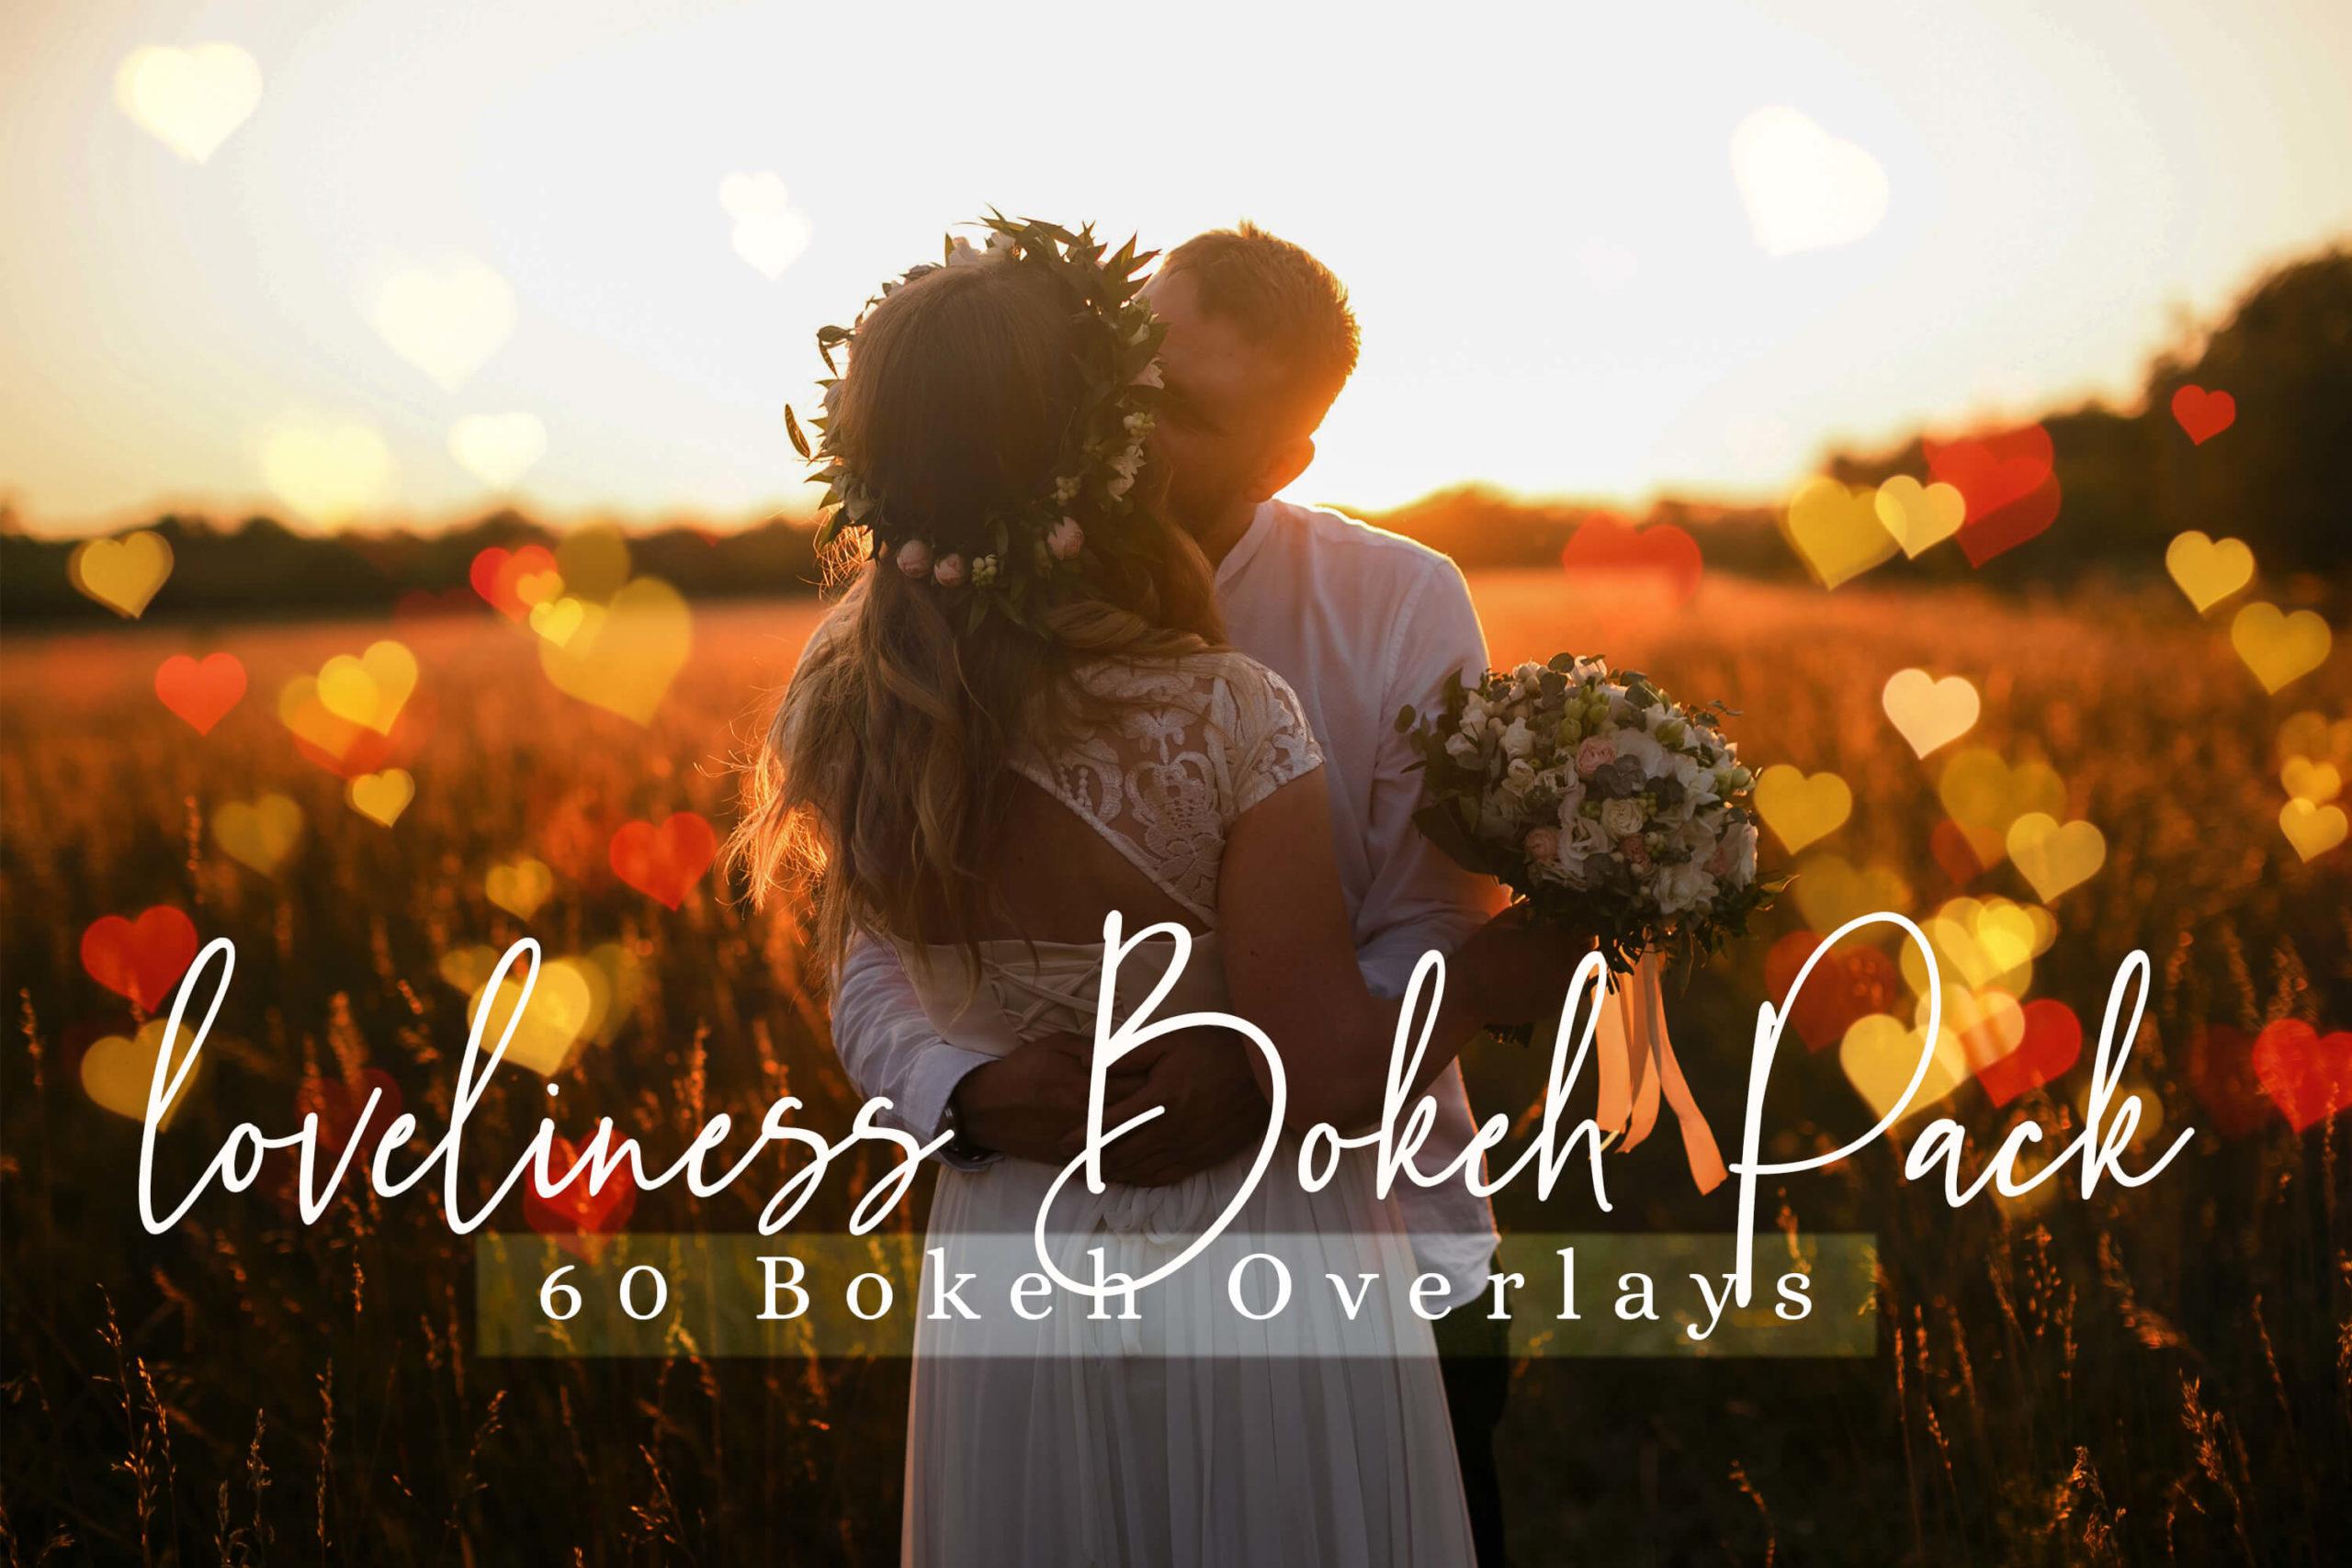 60 Loveliness Bokeh Pack Lights Photo Overlays